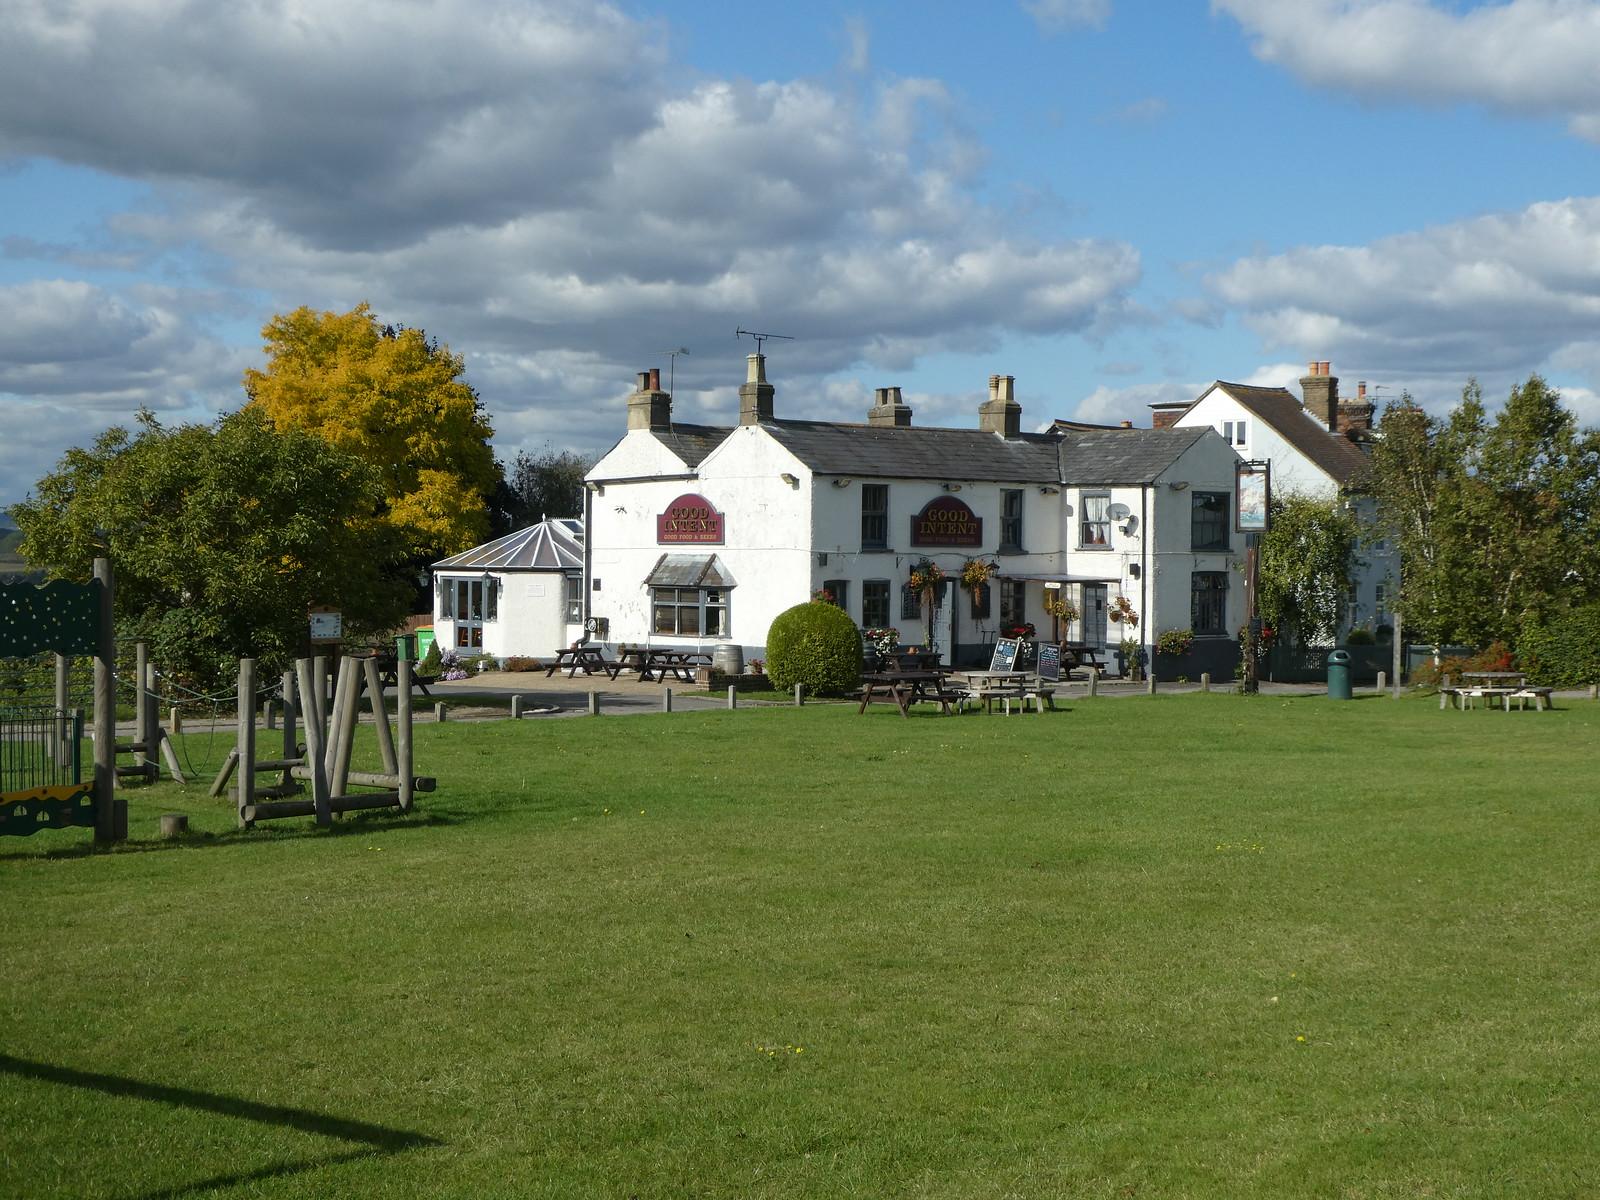 Farleigh Green Wateringbury Circular walk